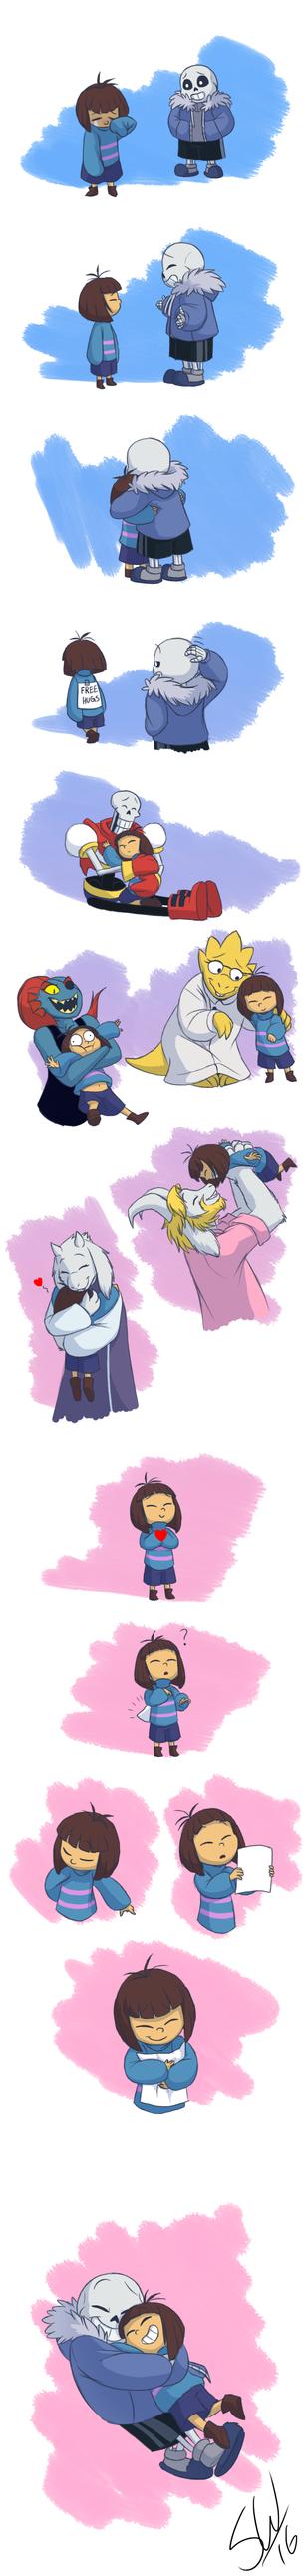 Undertale - The Legendary Hug Master by TC-96